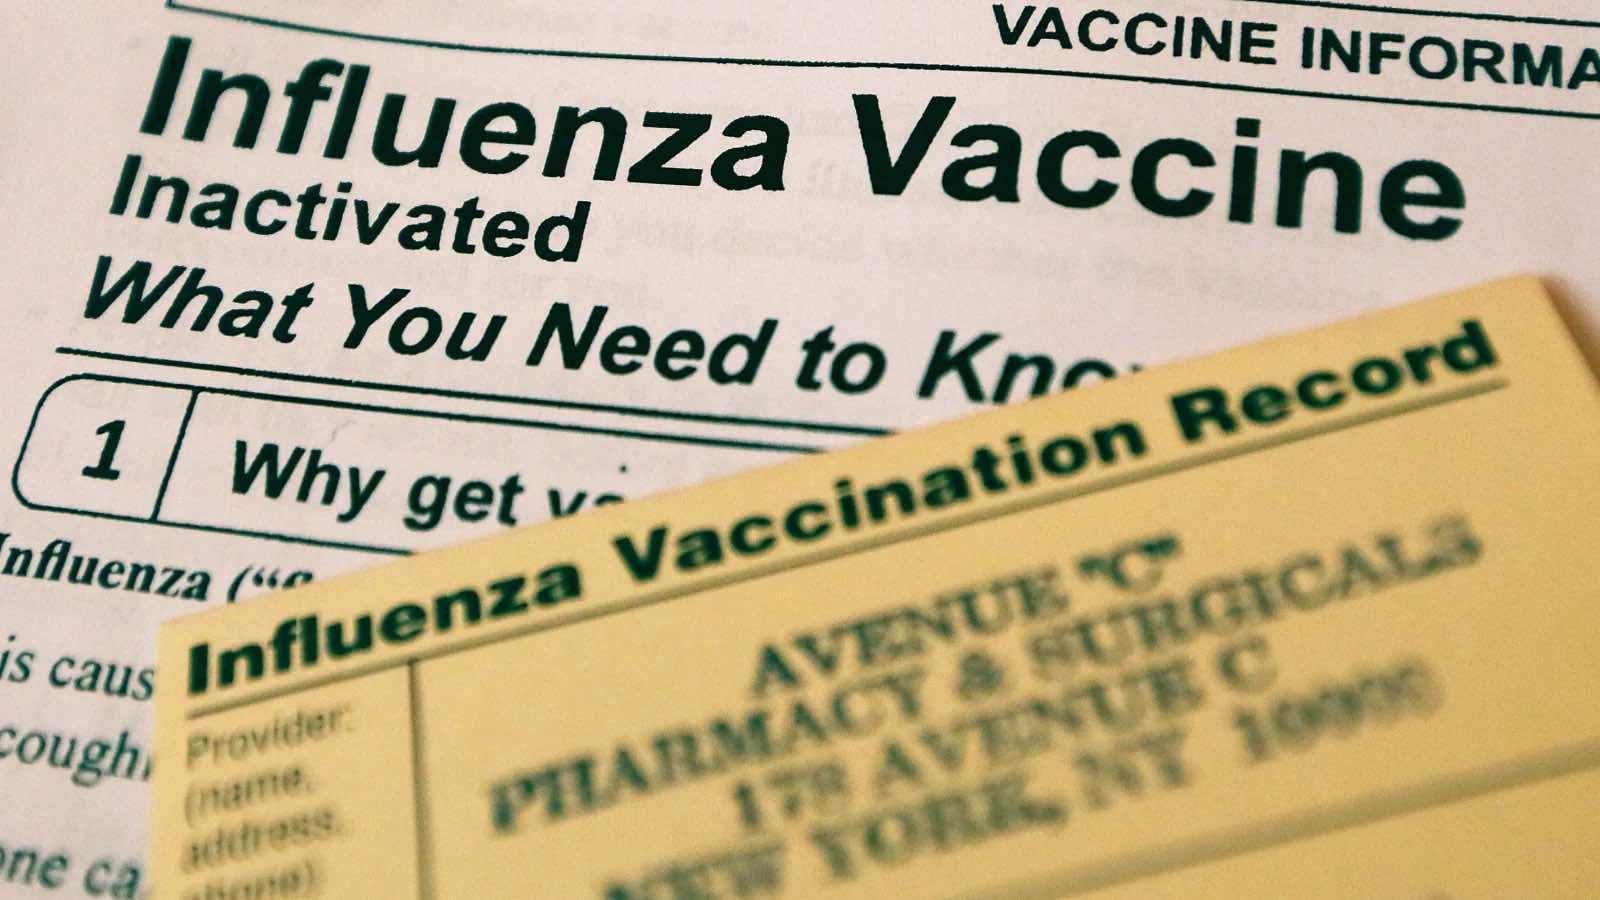 Flu vaccine 2